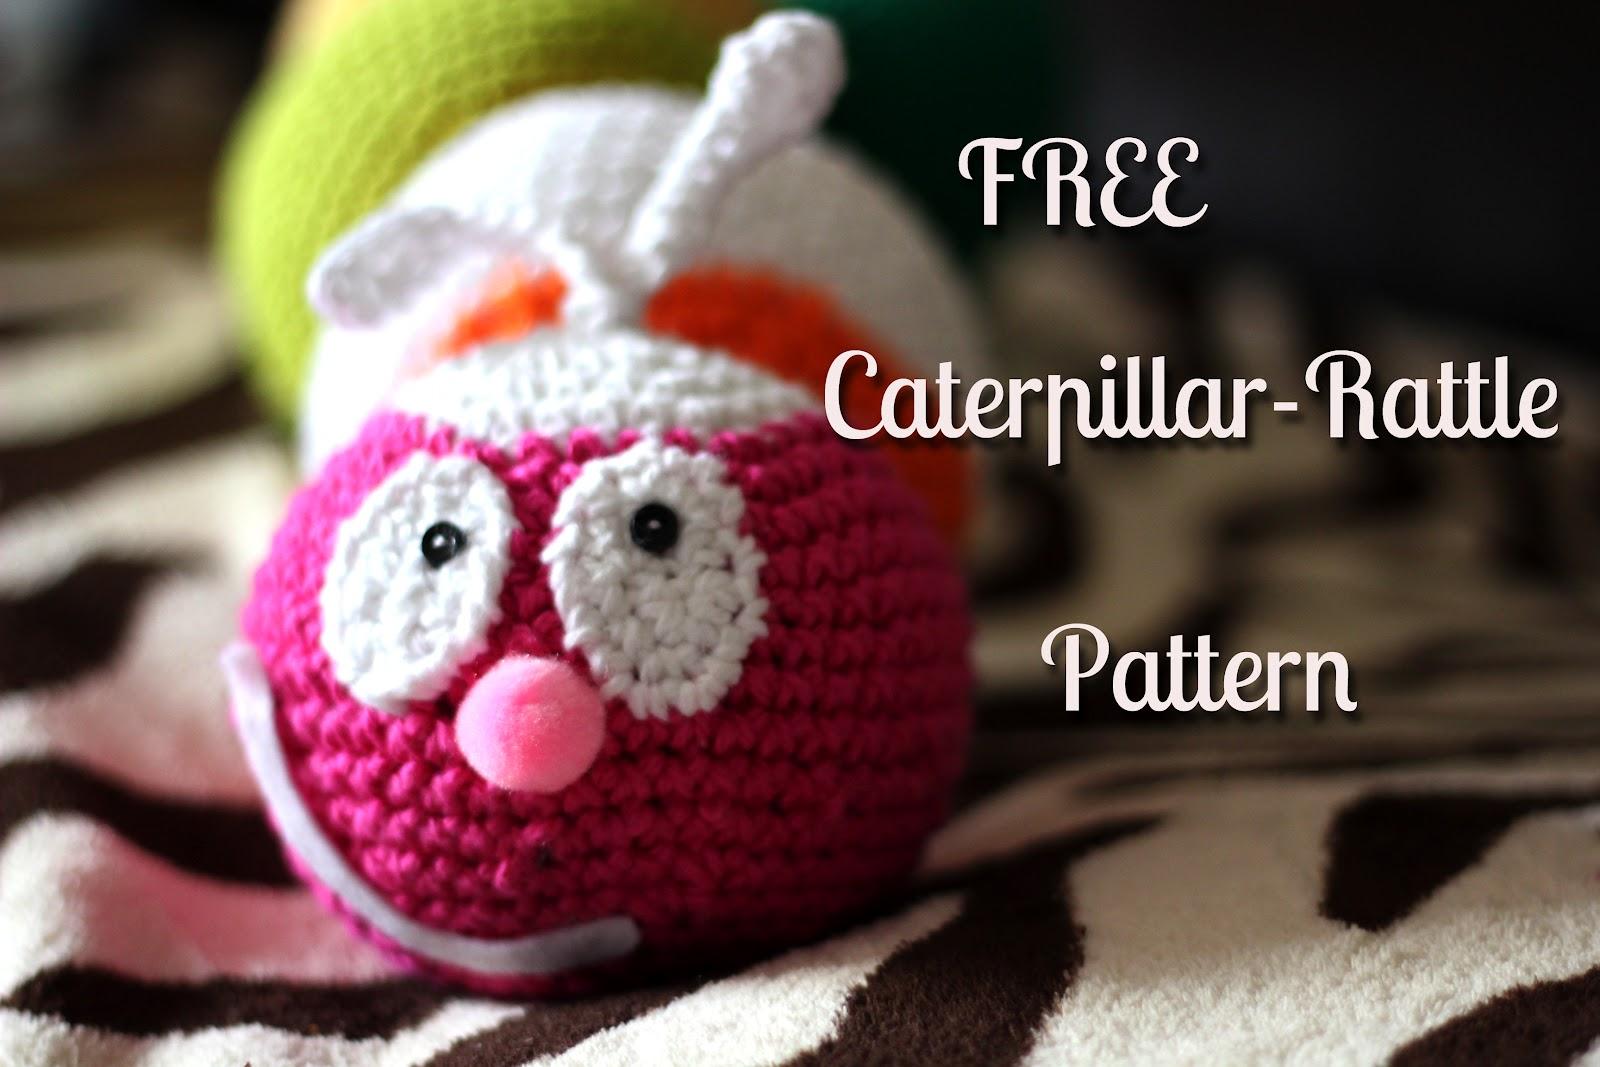 In Karapoozville: Caterpillar Rattle FREE pattern